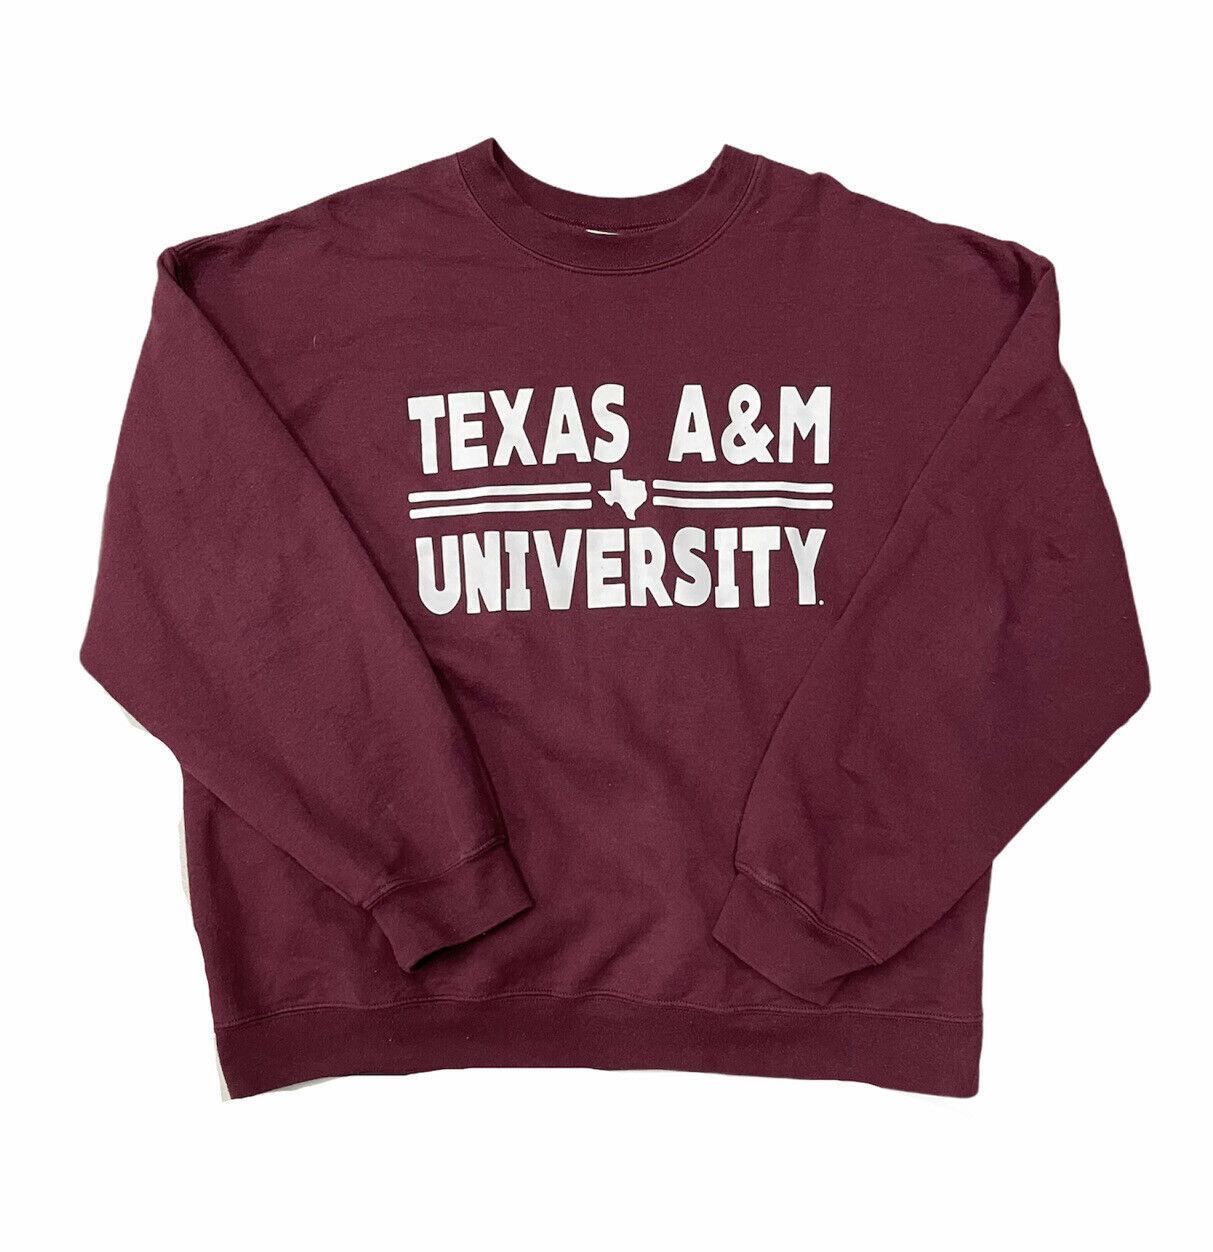 Vintage 90s Texas A&M Aggies Sweatshirt Size XL - $34.65